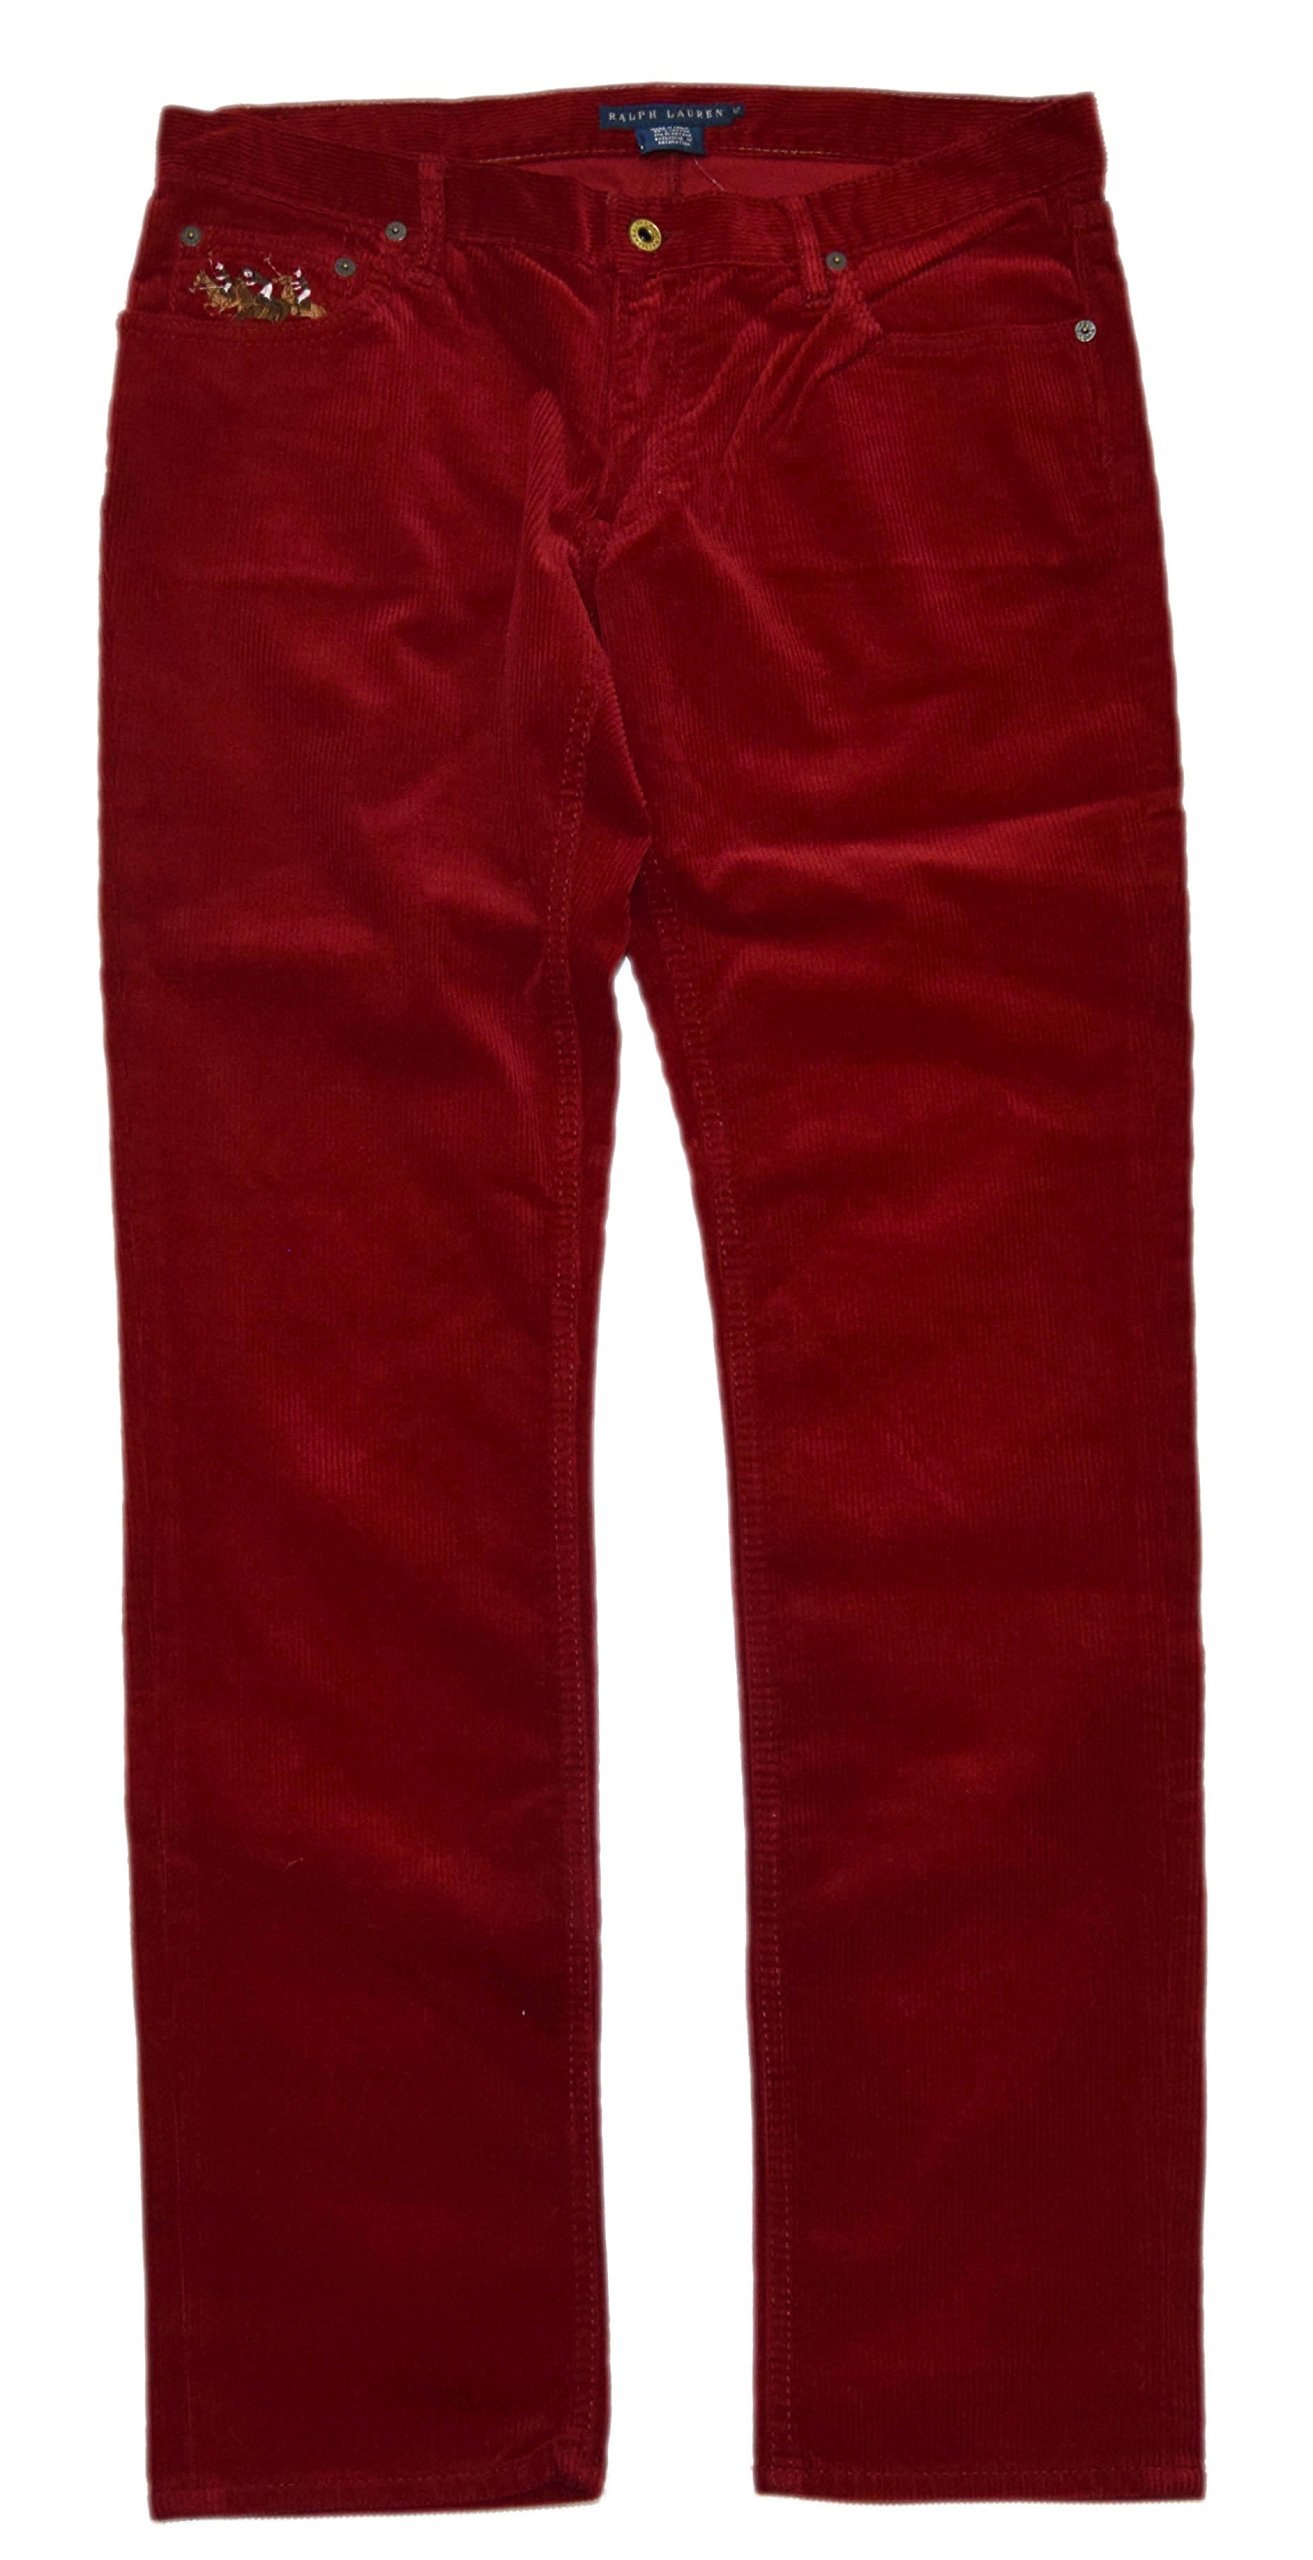 Ralph Lauren Women Big Pony Polo Match Skinny Slim Corduroy Jean Pants Red 12 10